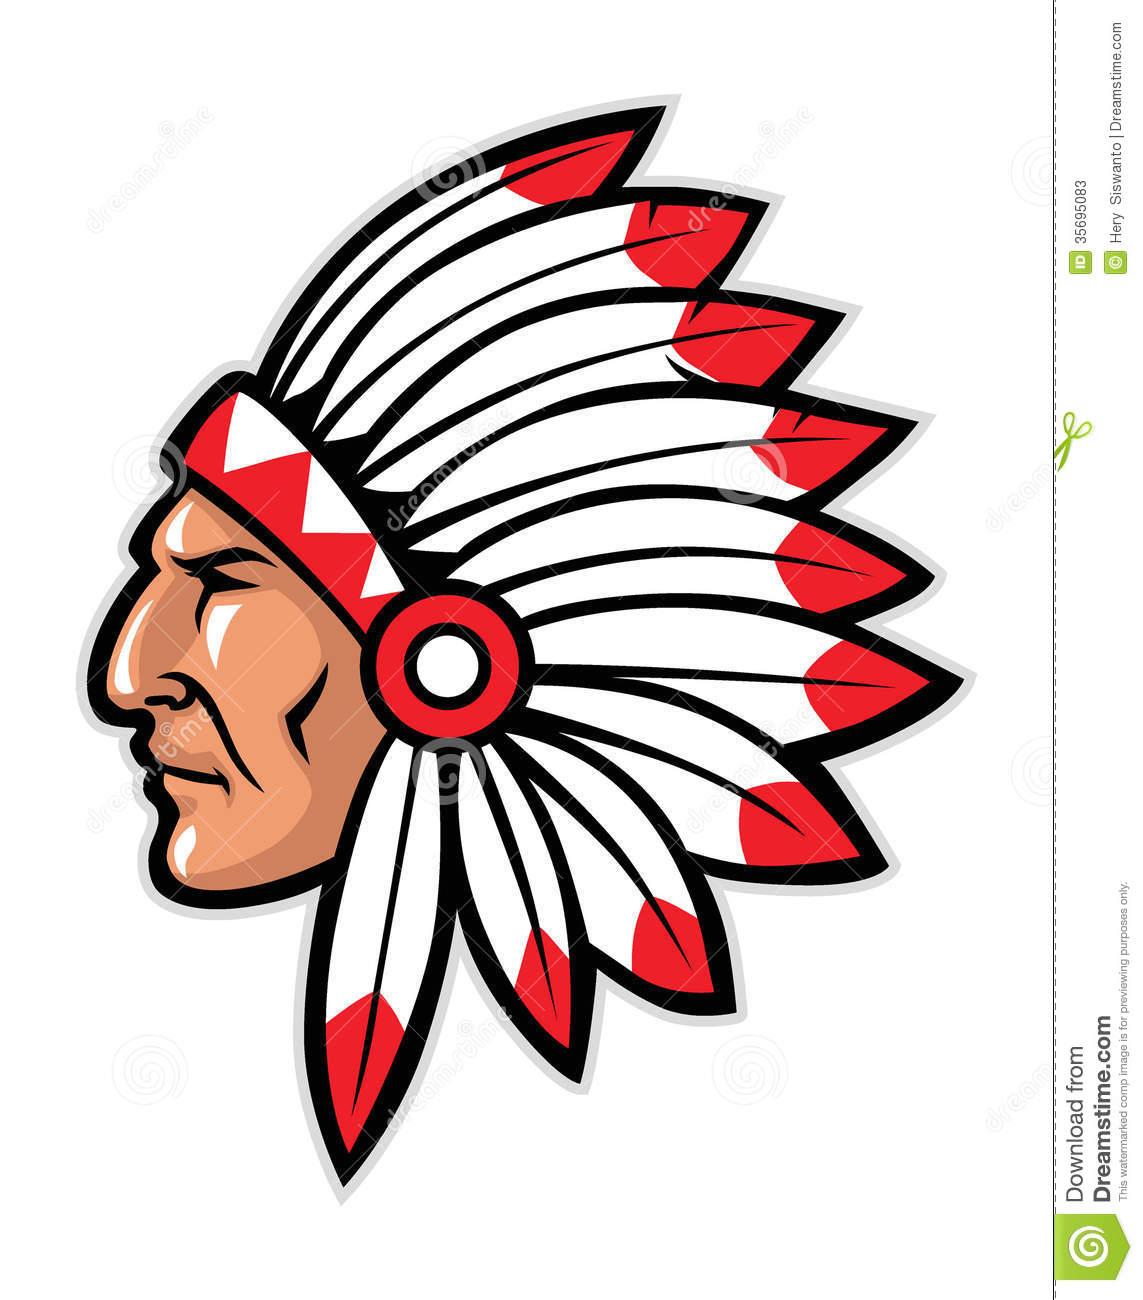 a0071a9dacb Indian Head Mascot - Indian Headdress Clipart